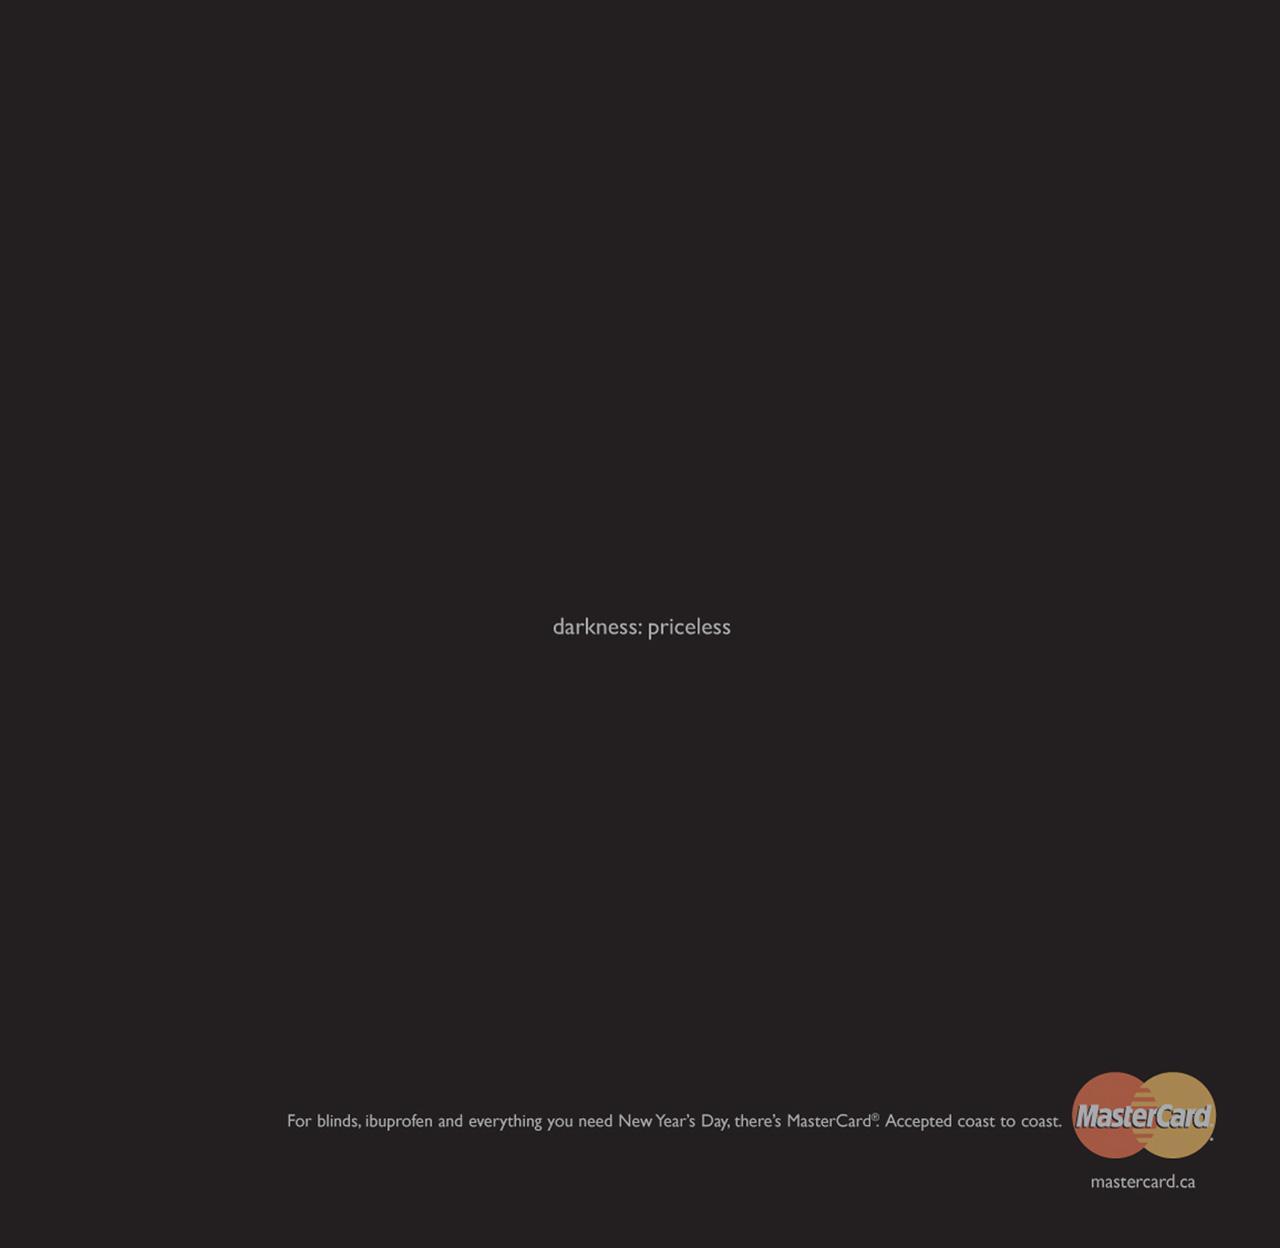 MasterCard Print Ad -  Darkness